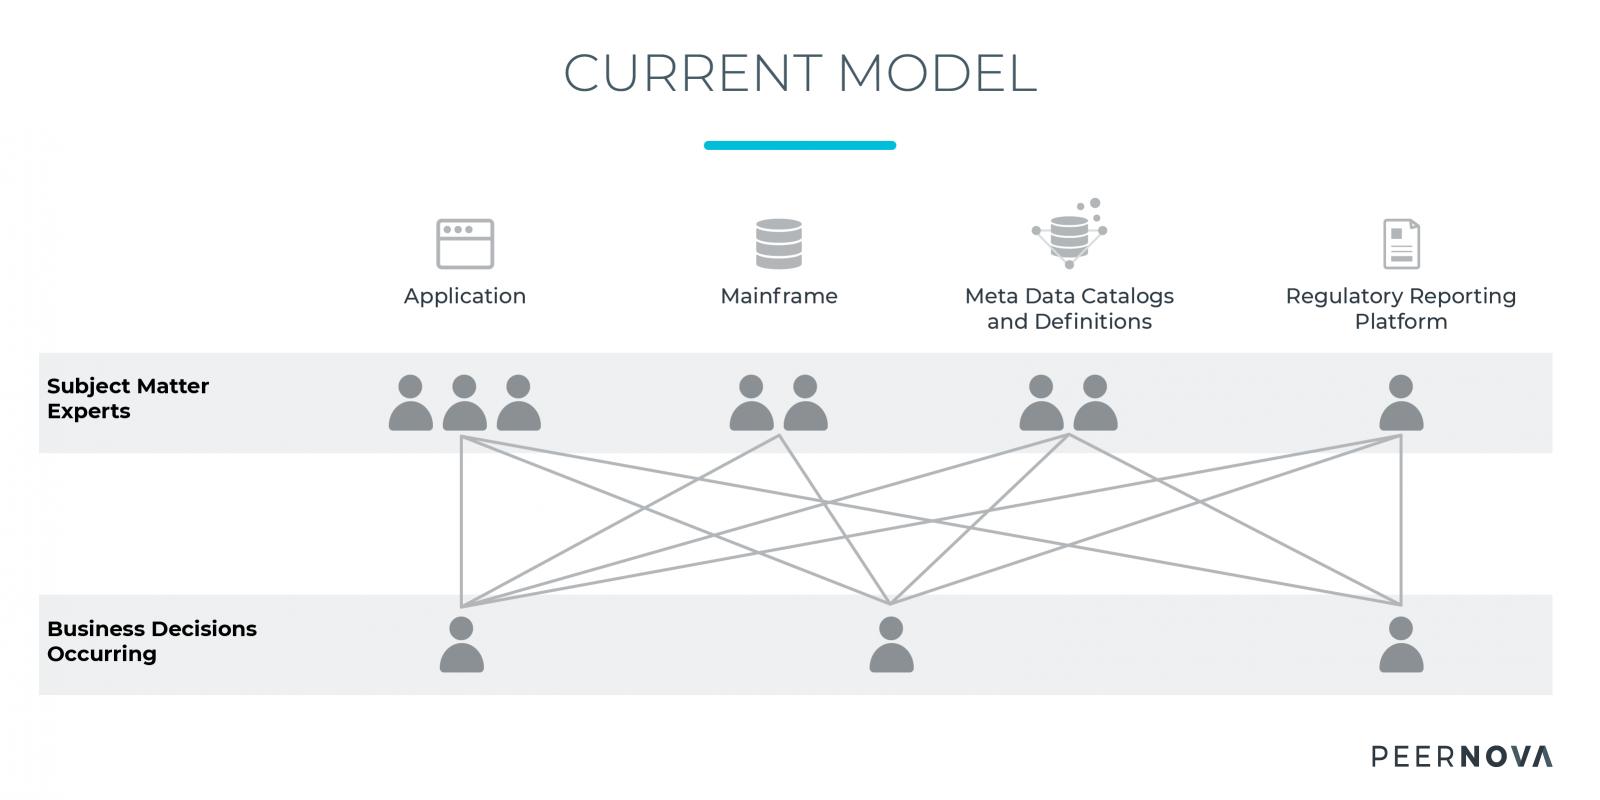 Current Model Needs Active Data Governance